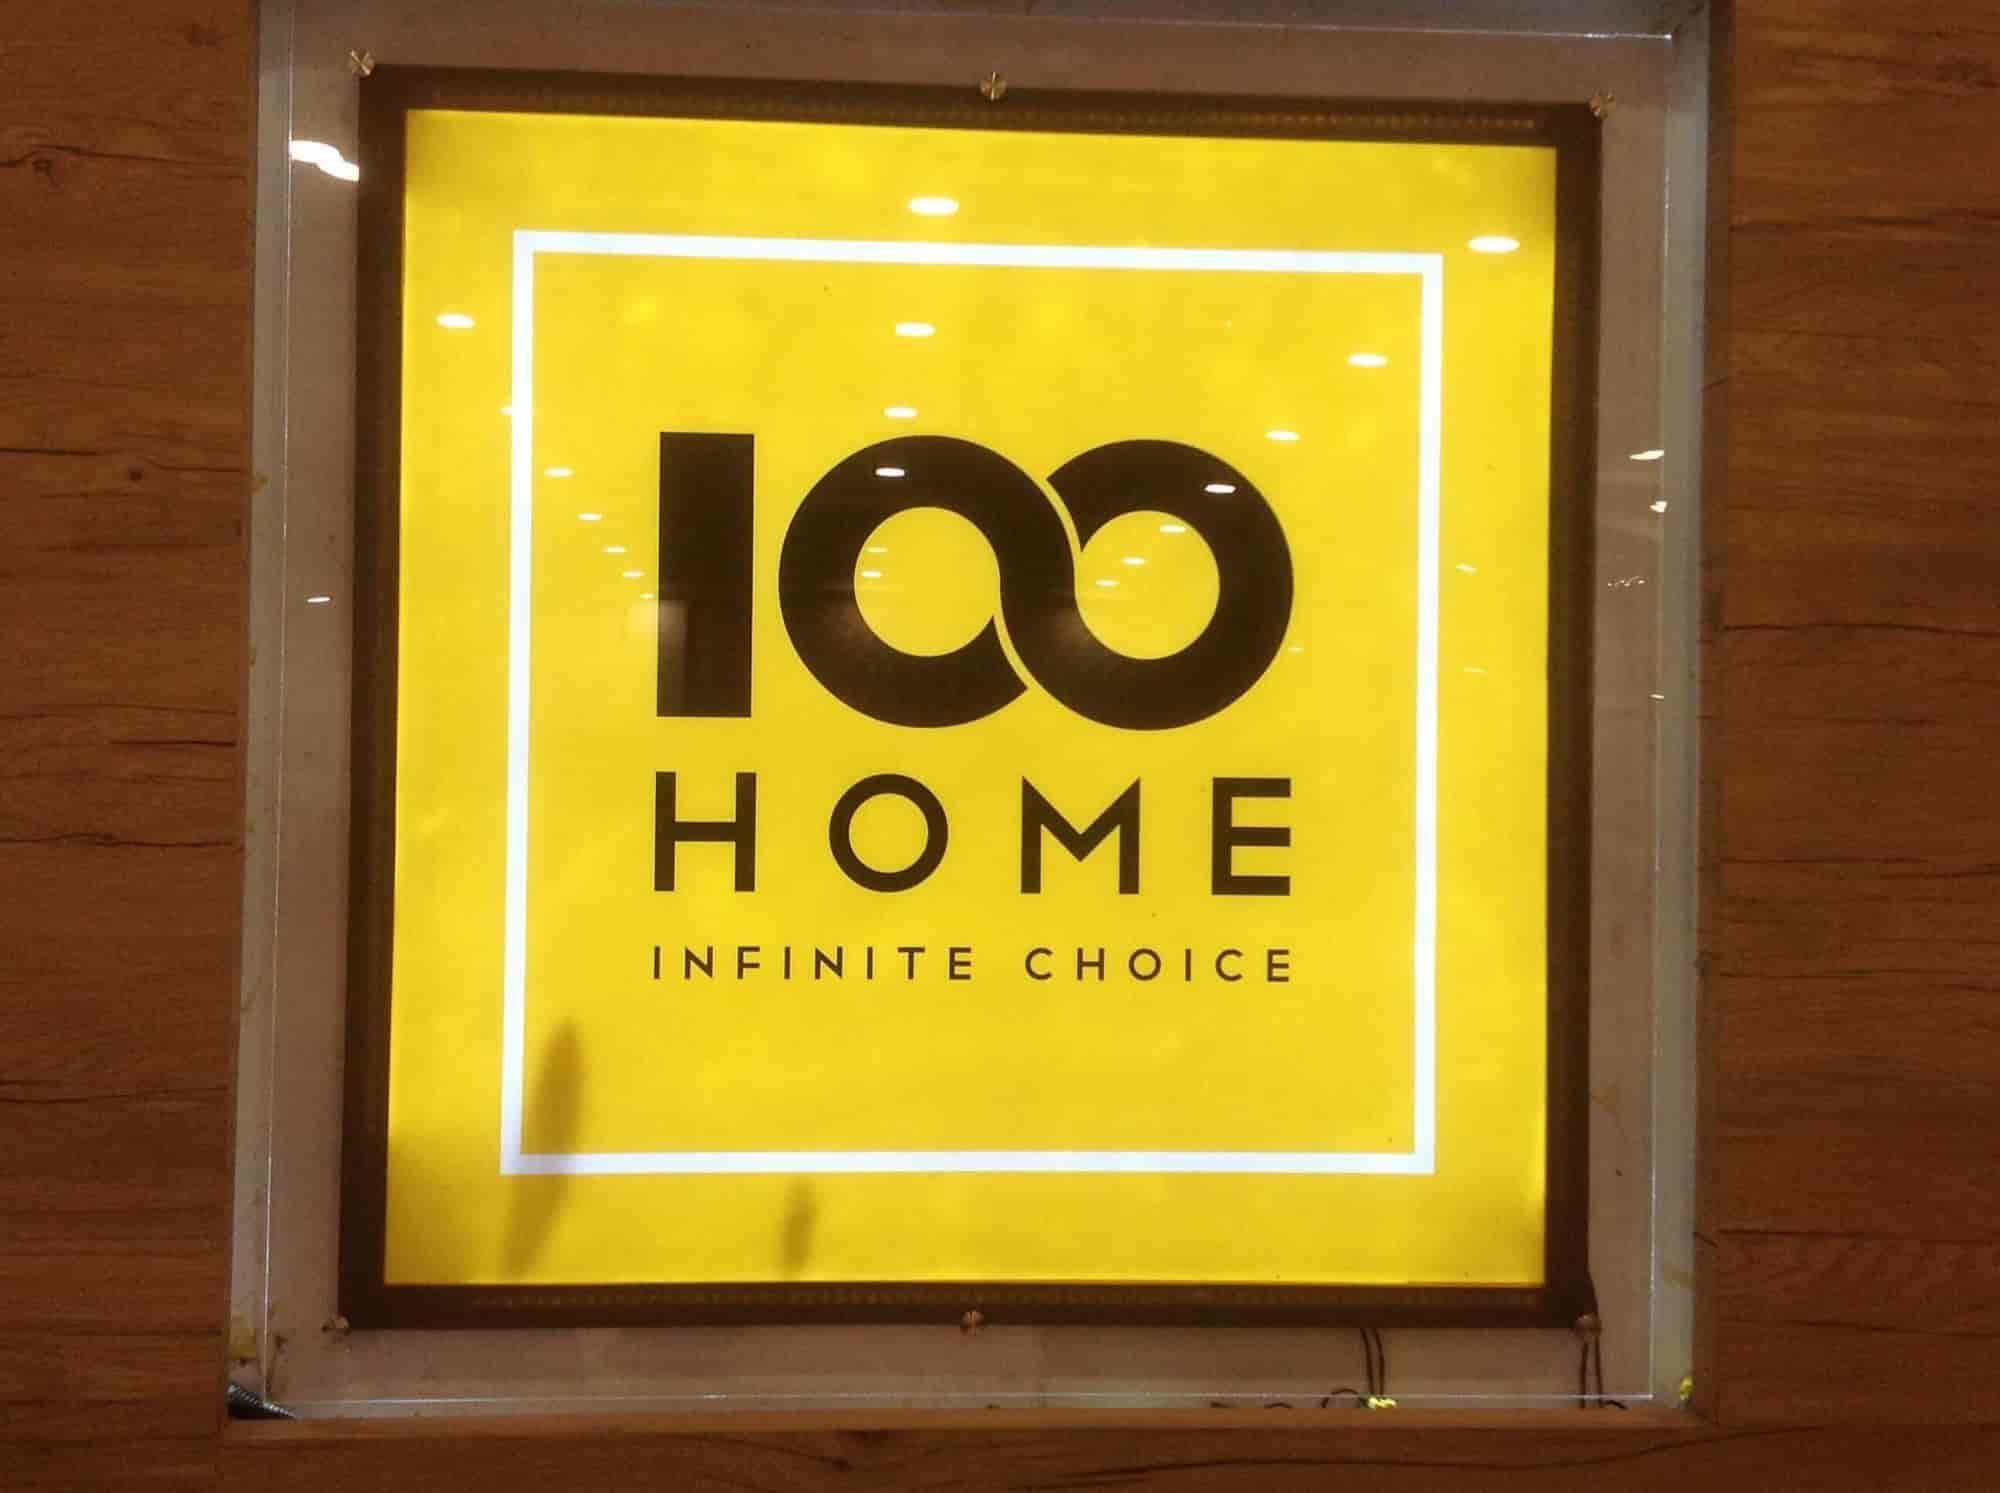 100 home furniture interiors